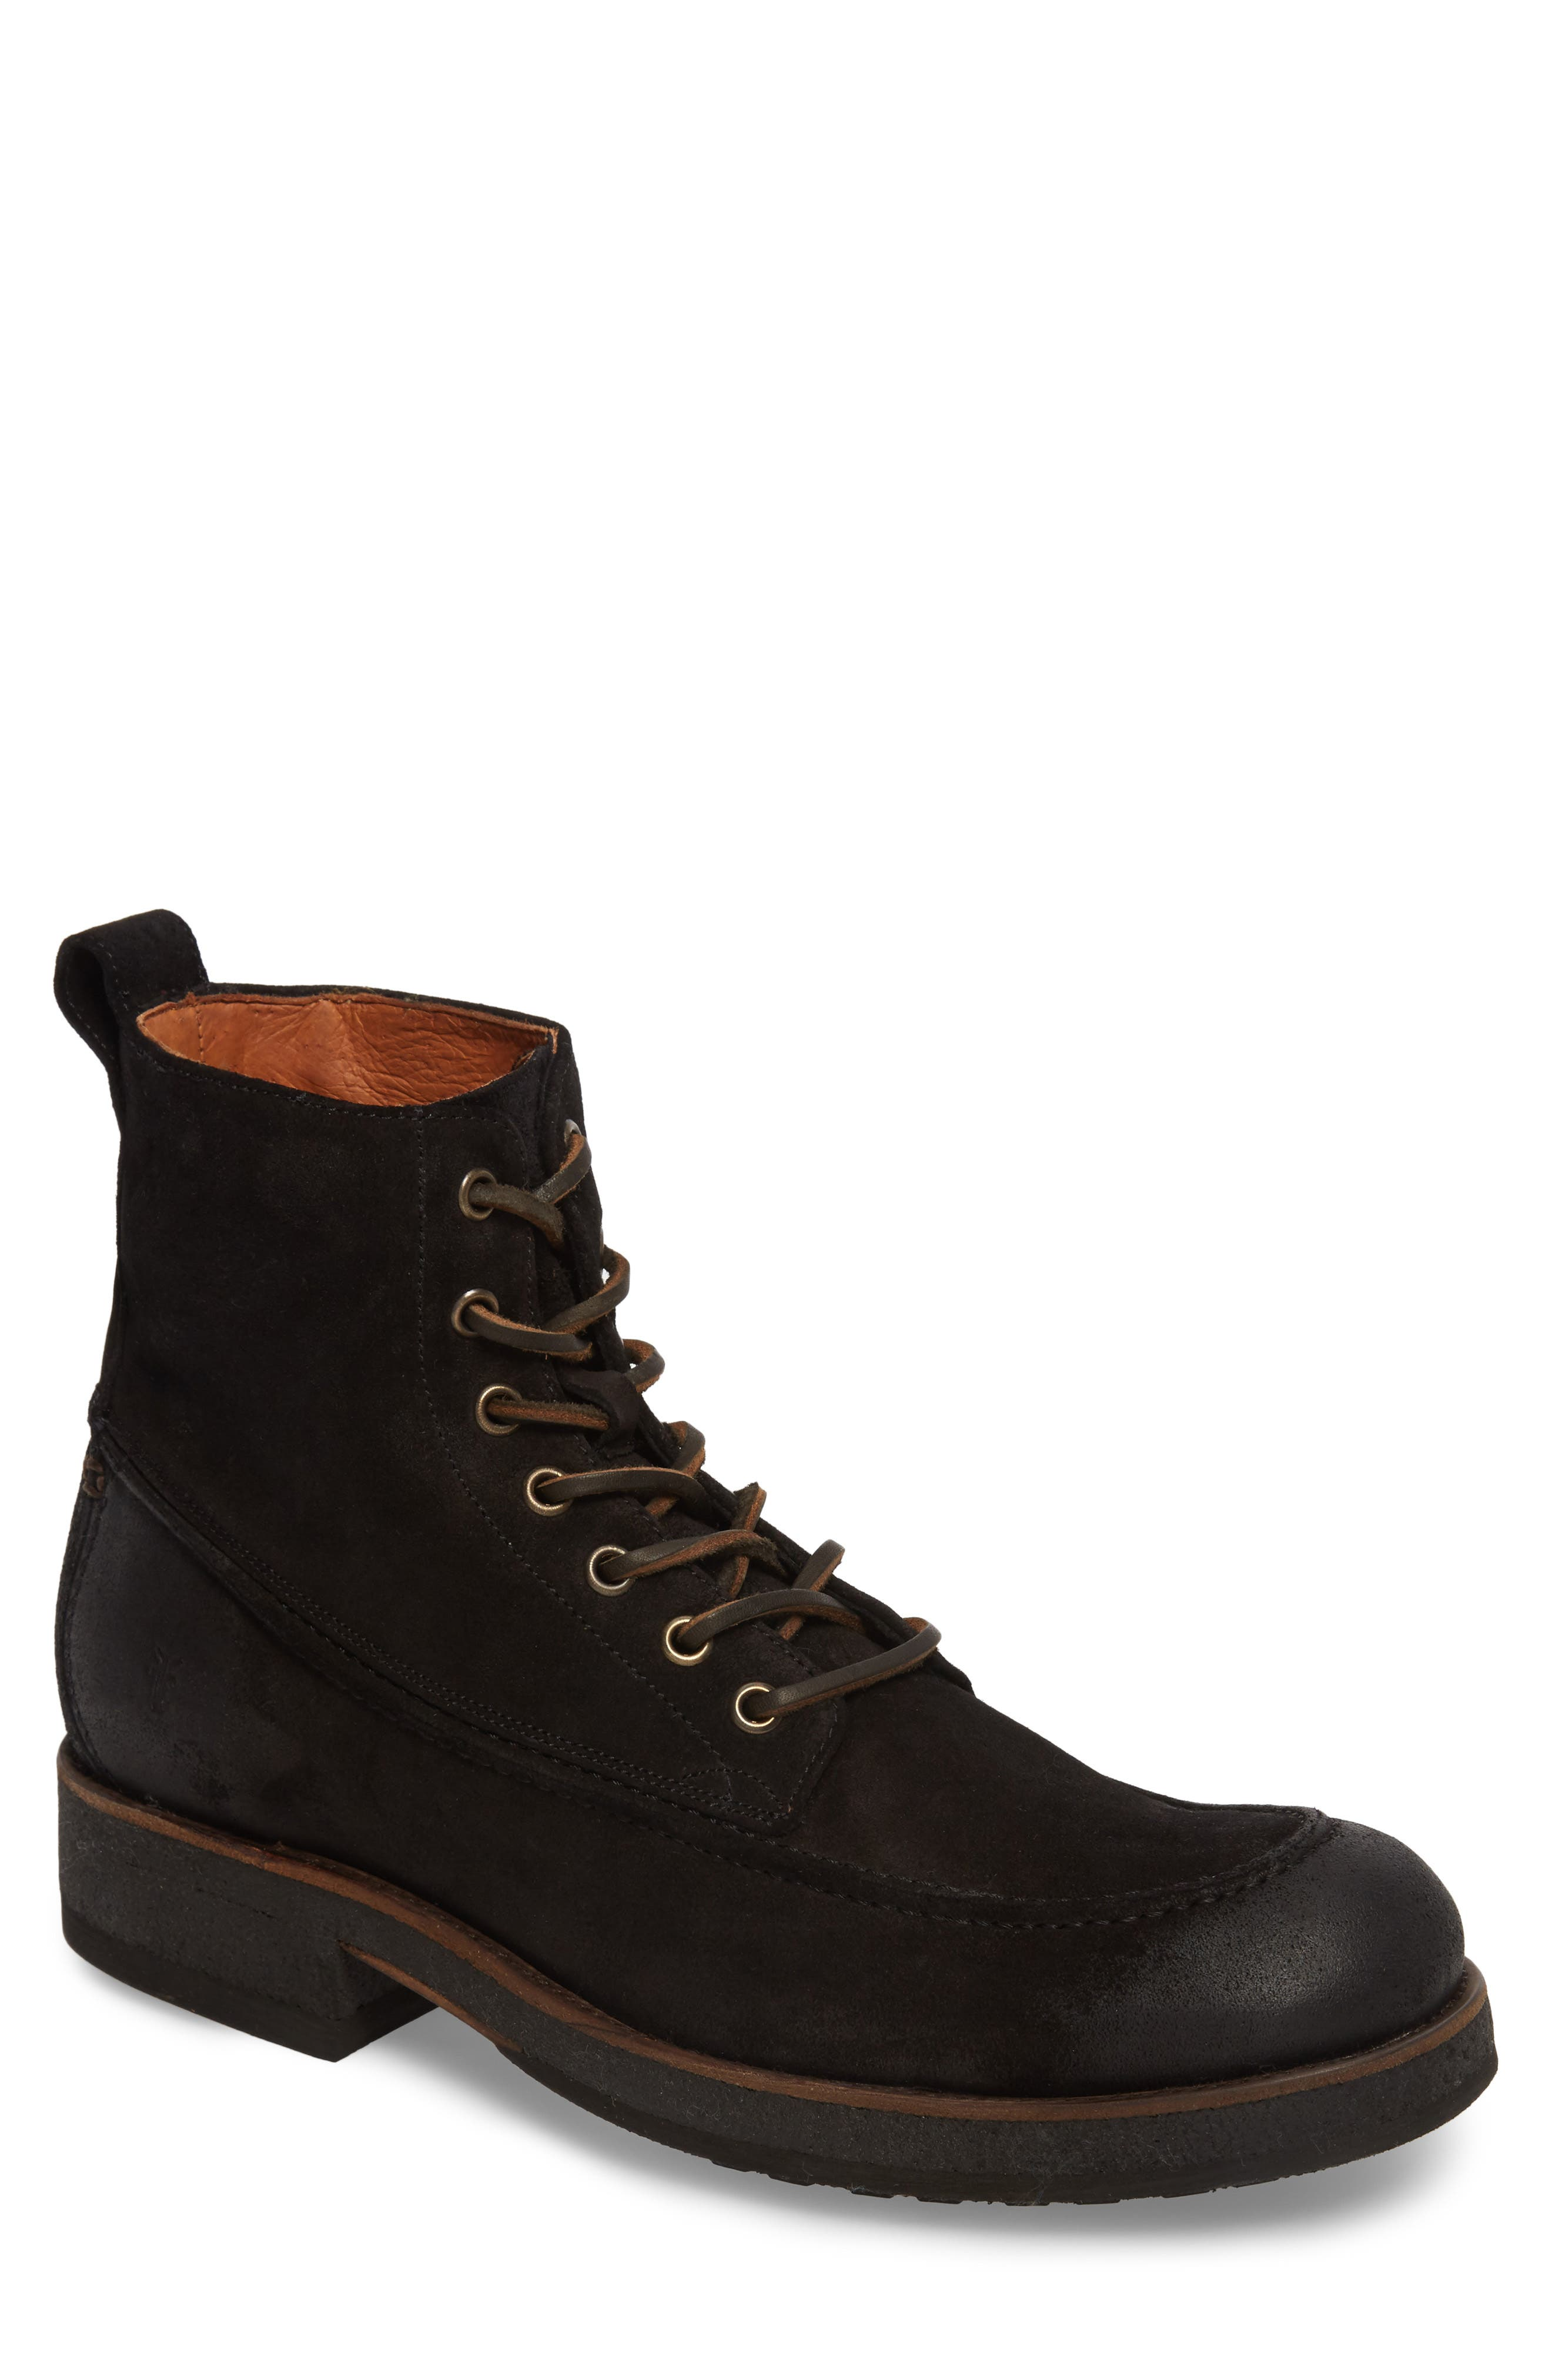 Rainier Waxed Work Boot,                             Main thumbnail 1, color,                             Black Waxed Suede